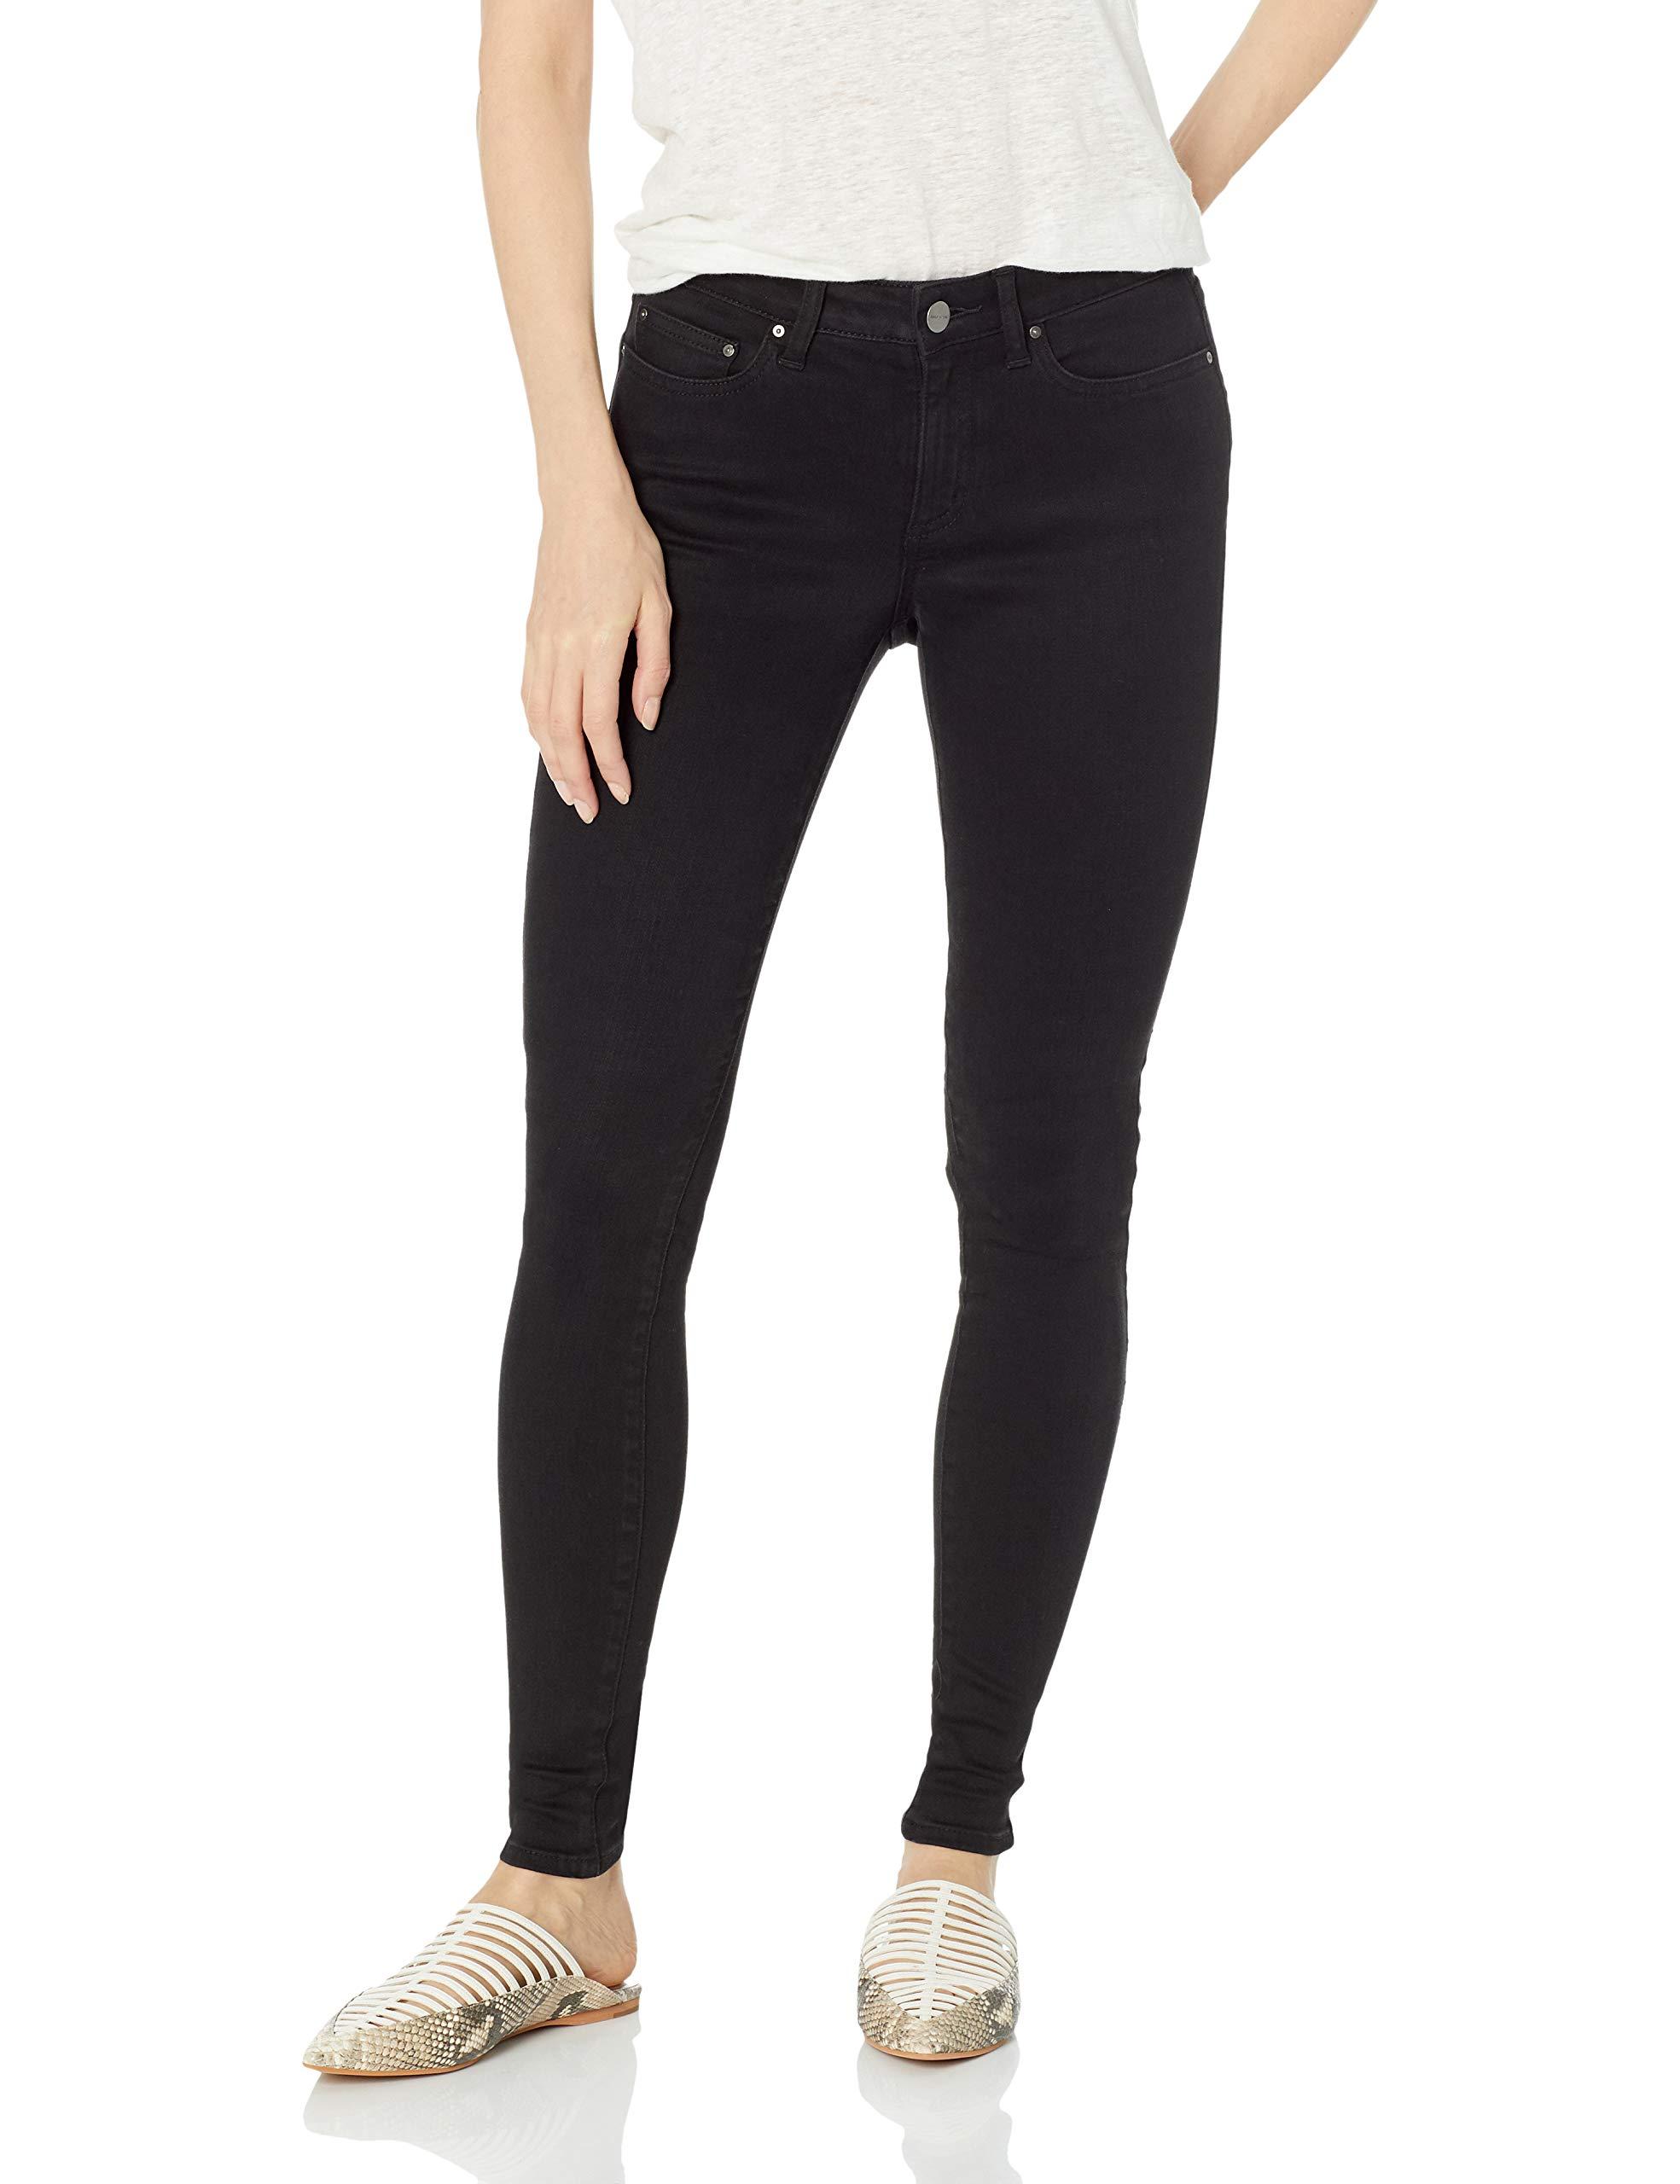 Amazon Brand - Daily Ritual Women's Mid-Rise Skinny Jean, Black, 29 (8) Regular by Daily Ritual